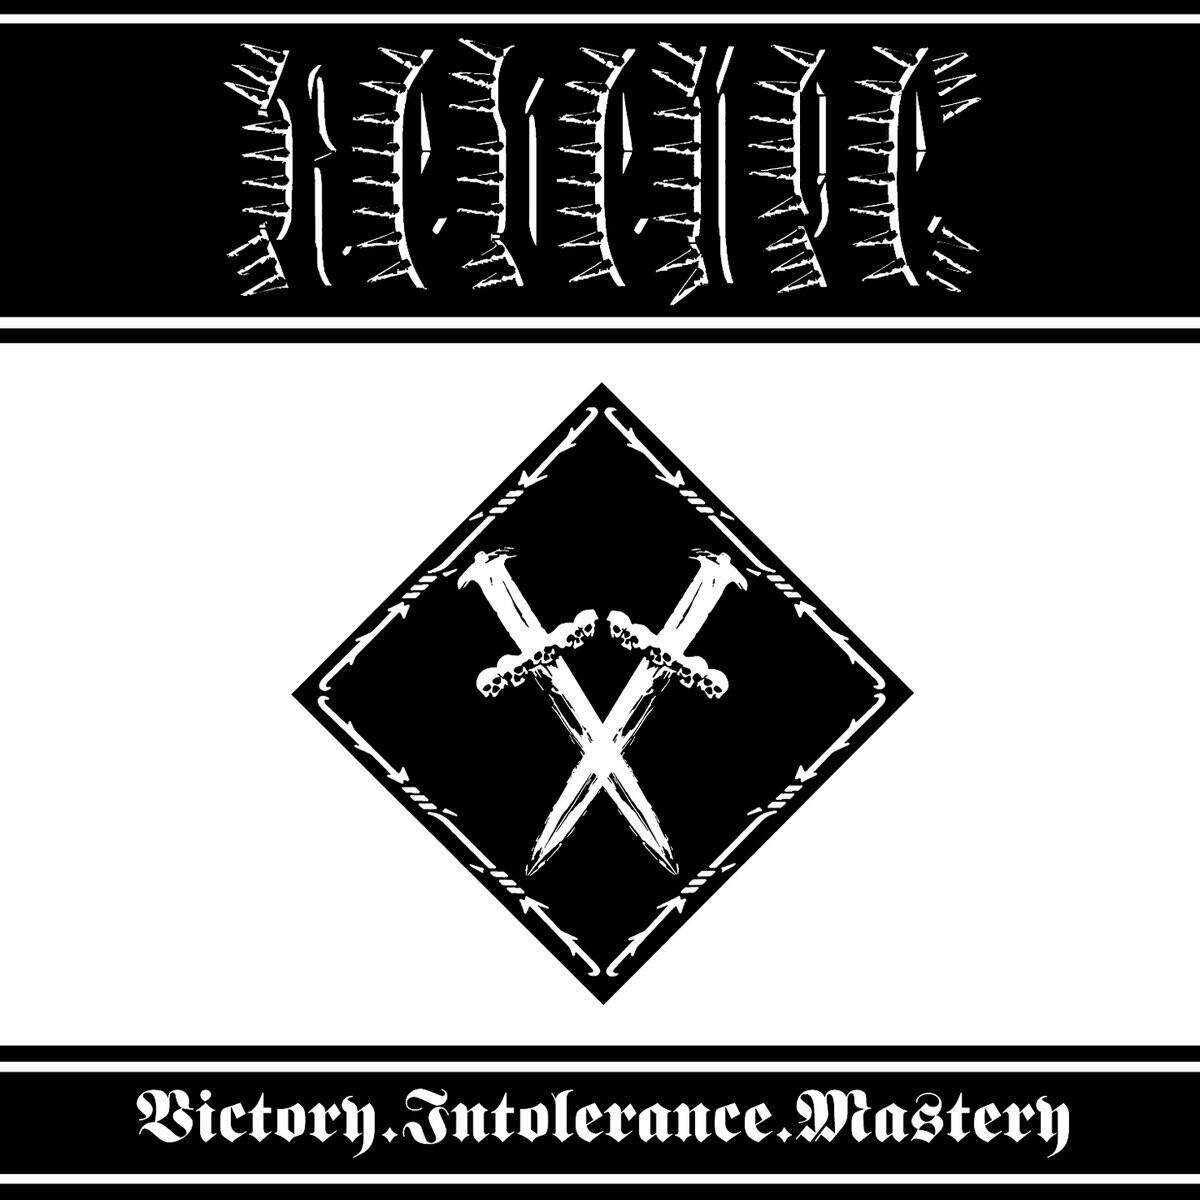 Revenge - Victory.Intolerance.Mastery